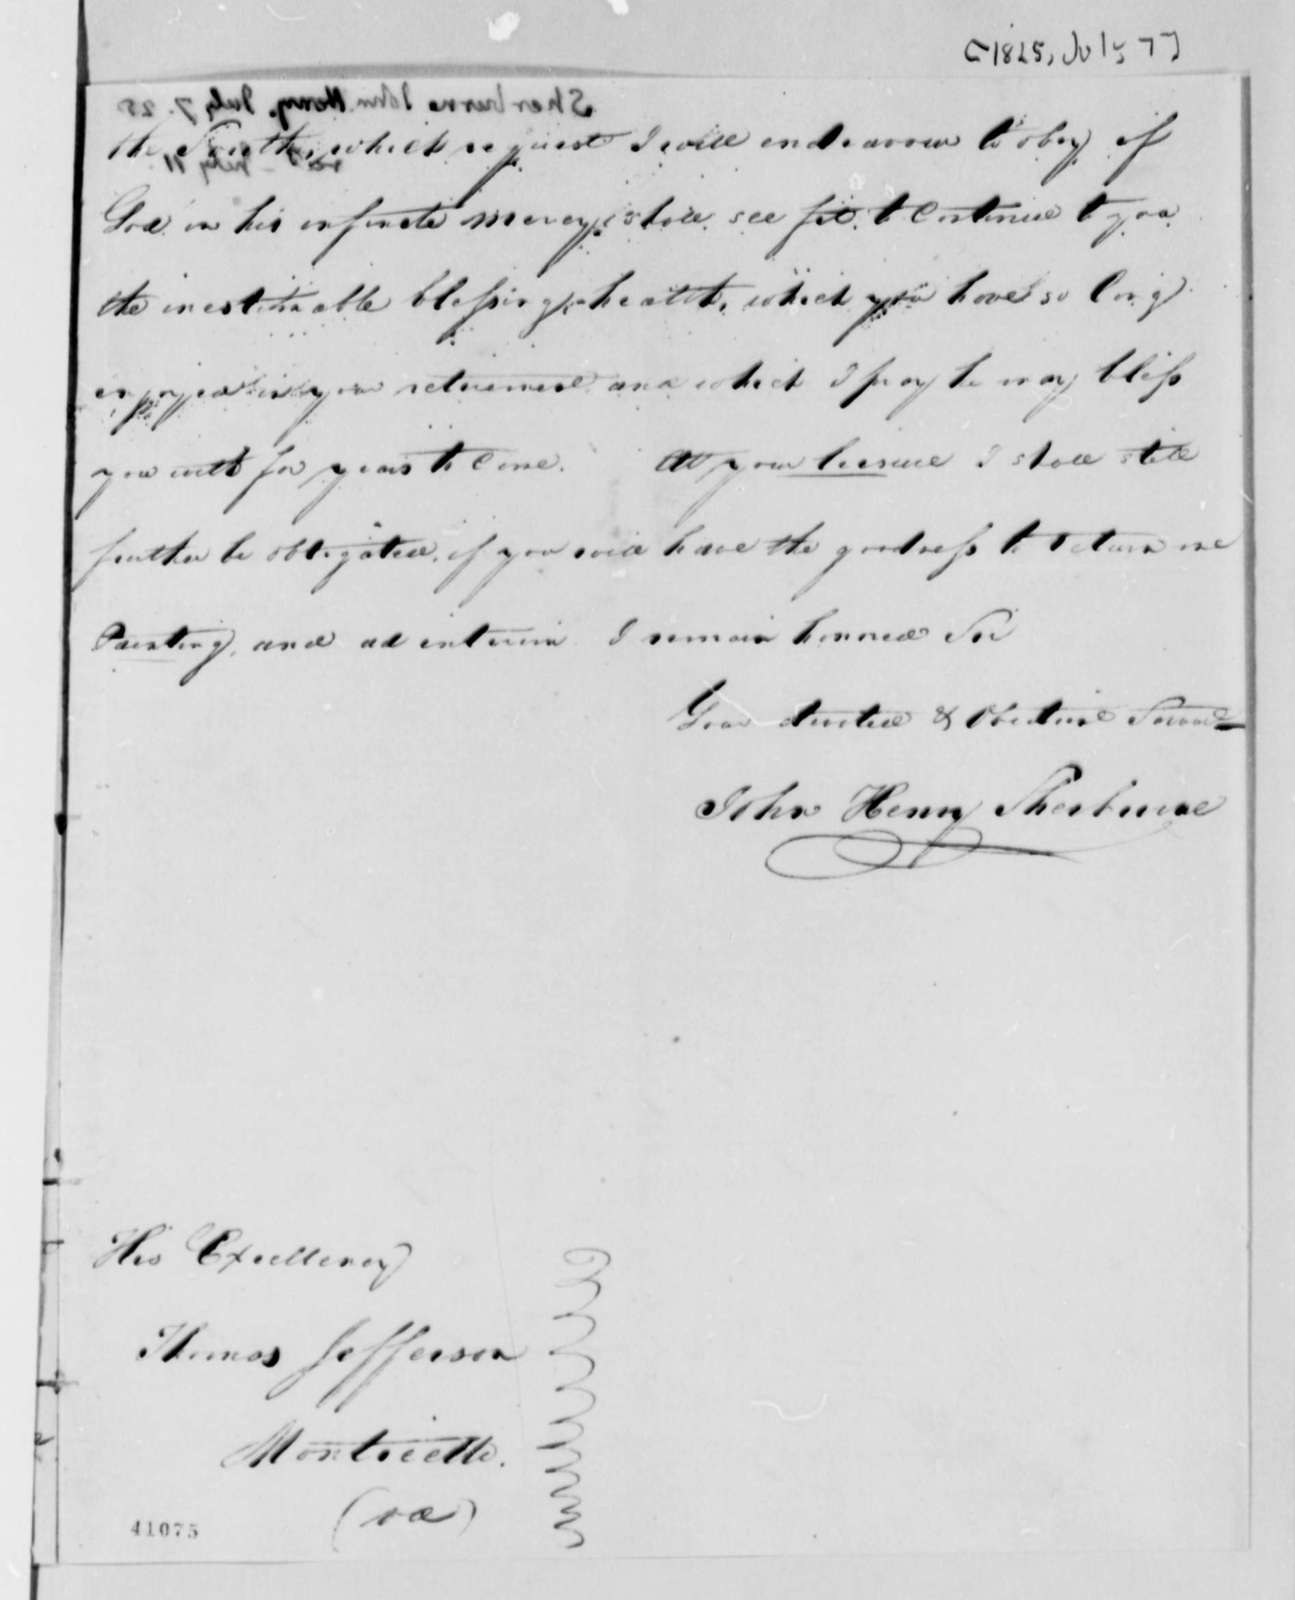 John Henry Sherburne to Thomas Jefferson, July 7, 1825